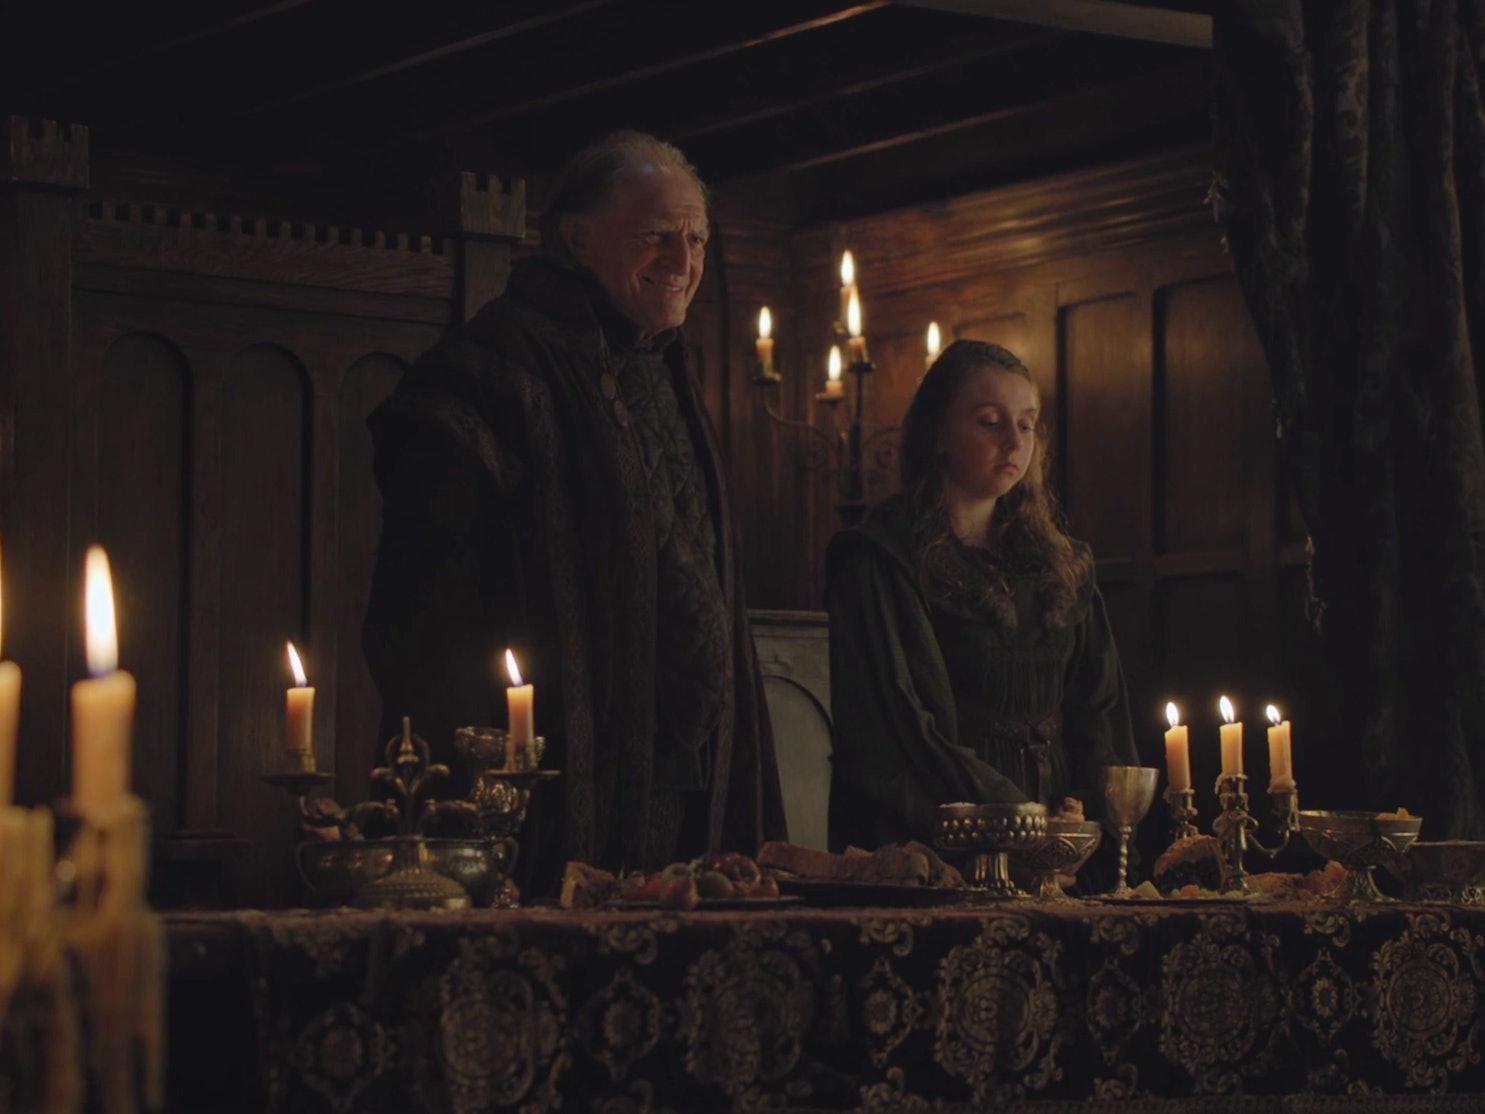 walder frey arya stark game of thrones season seven 7 premiere feast opening